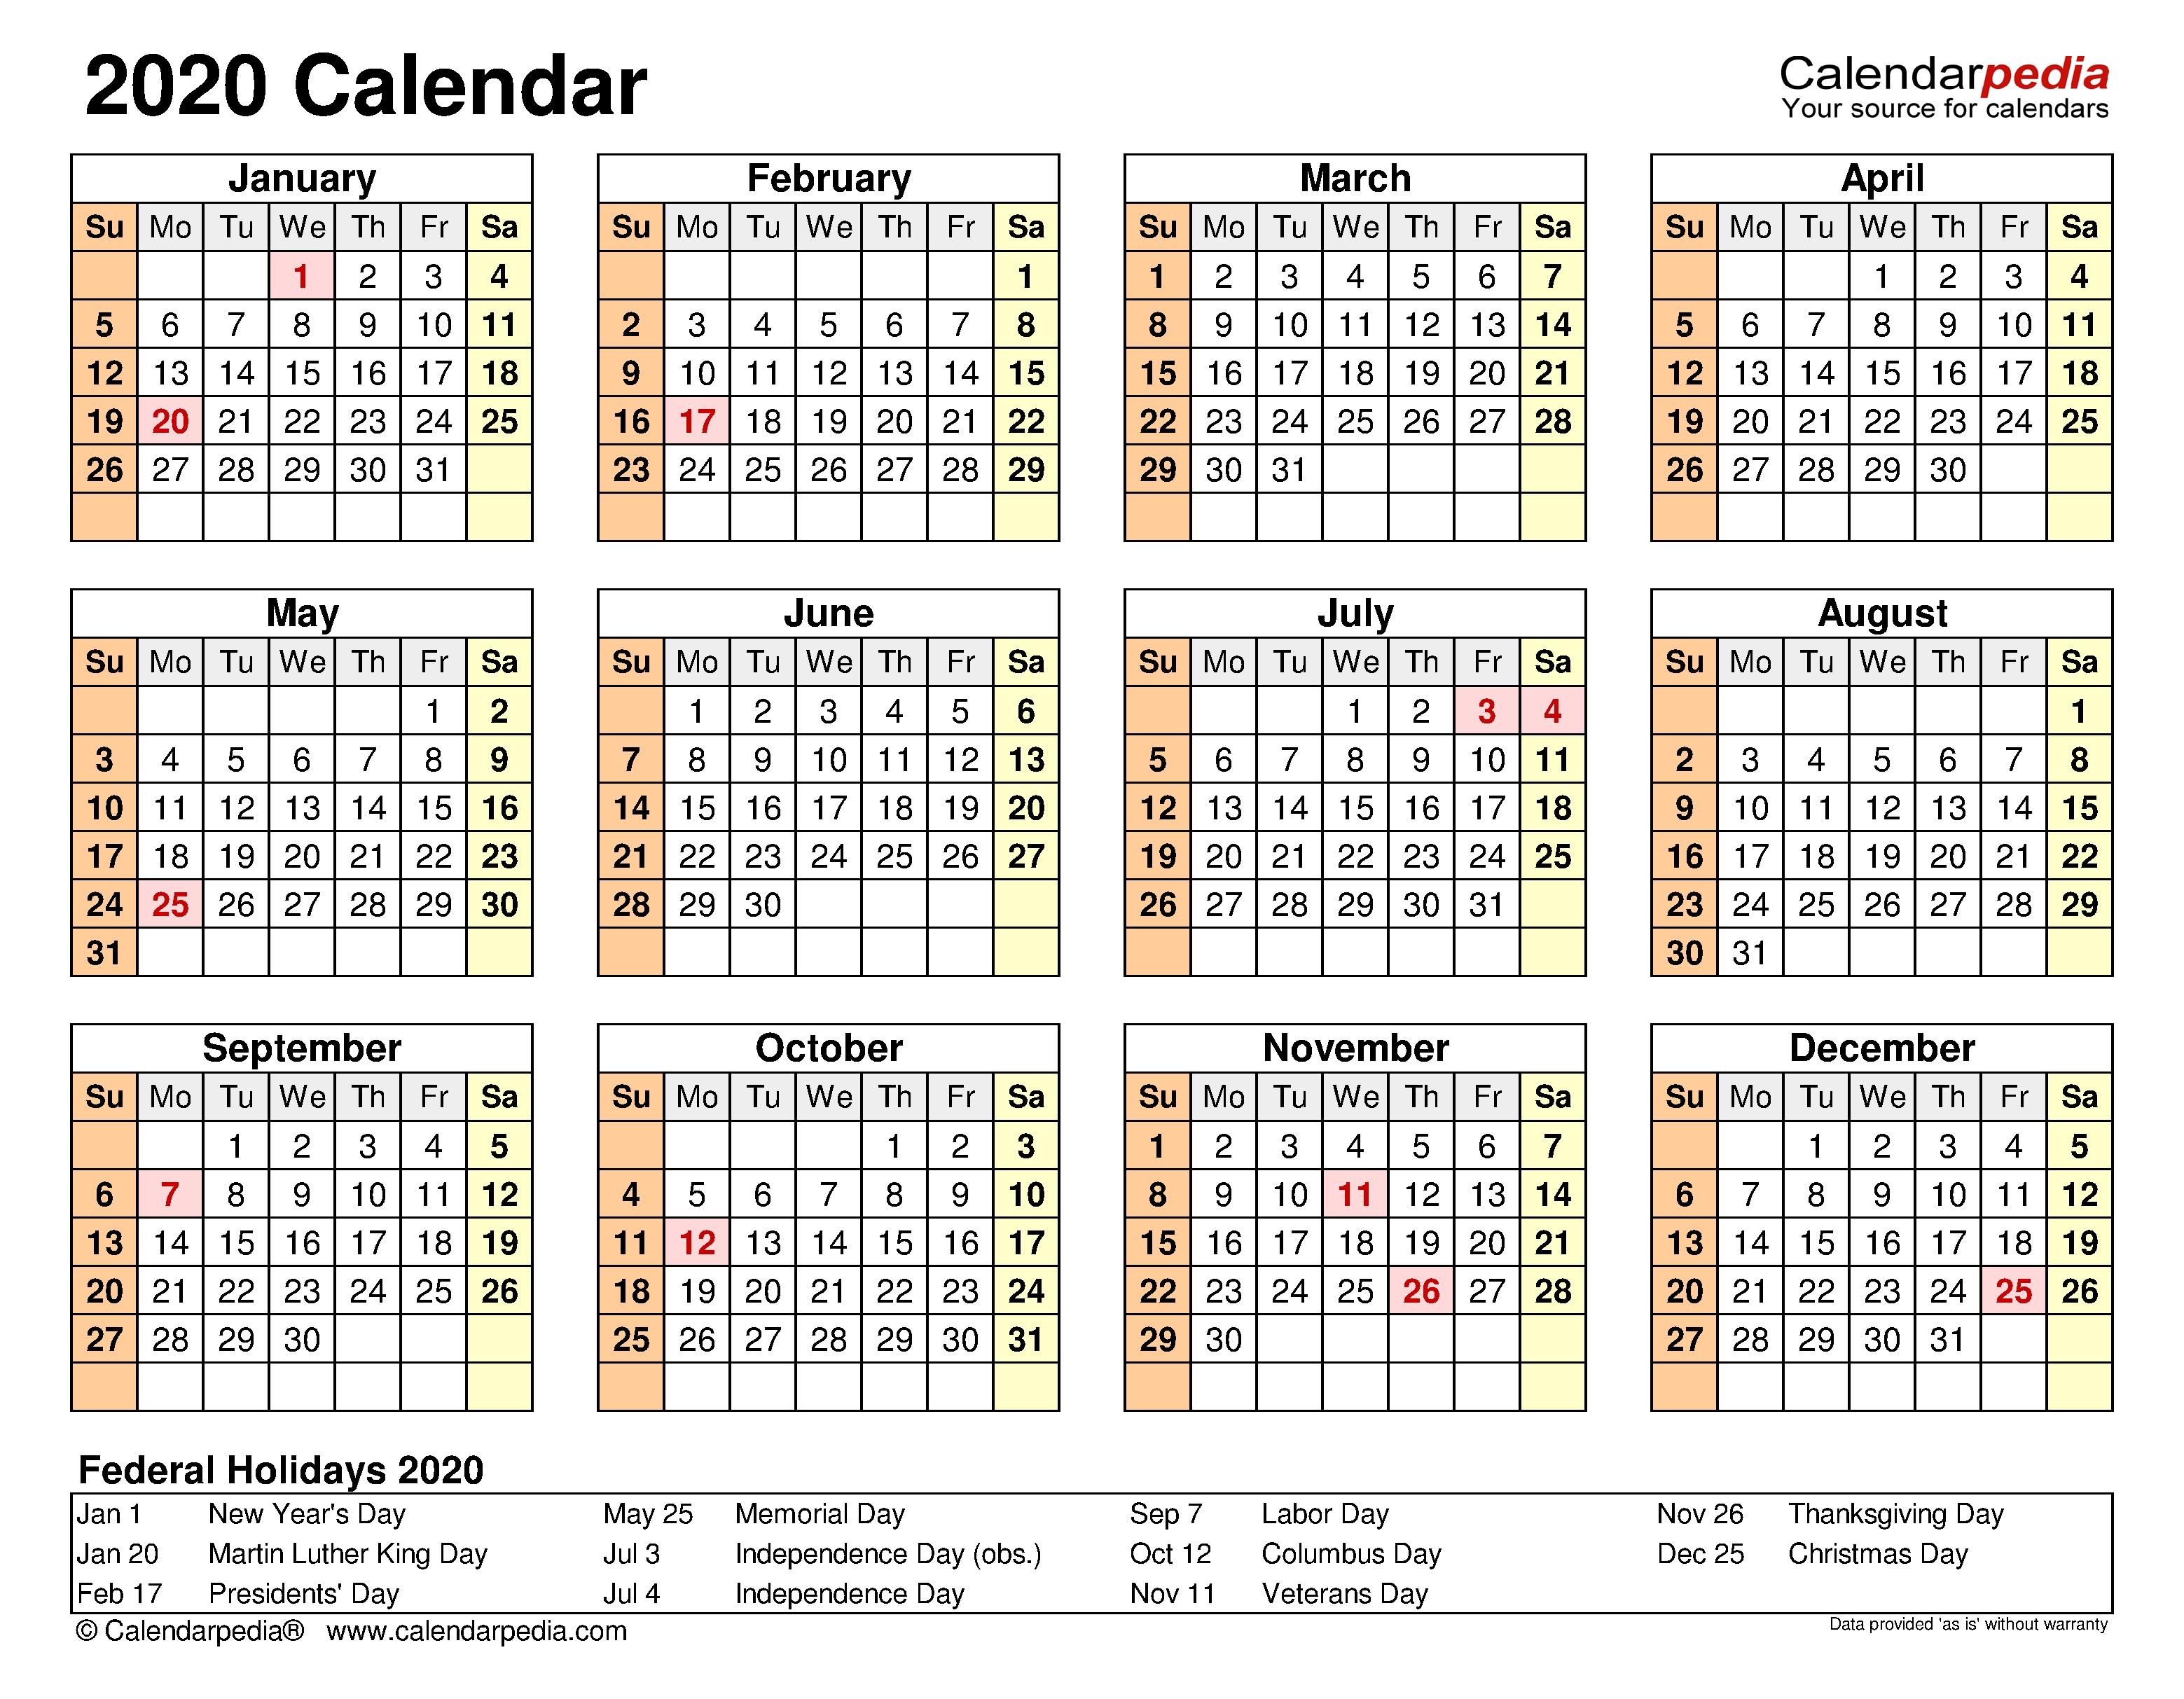 2020 Calendar - Free Printable Excel Templates - Calendarpedia 2021 Myanmar Calendar Microsoft Office